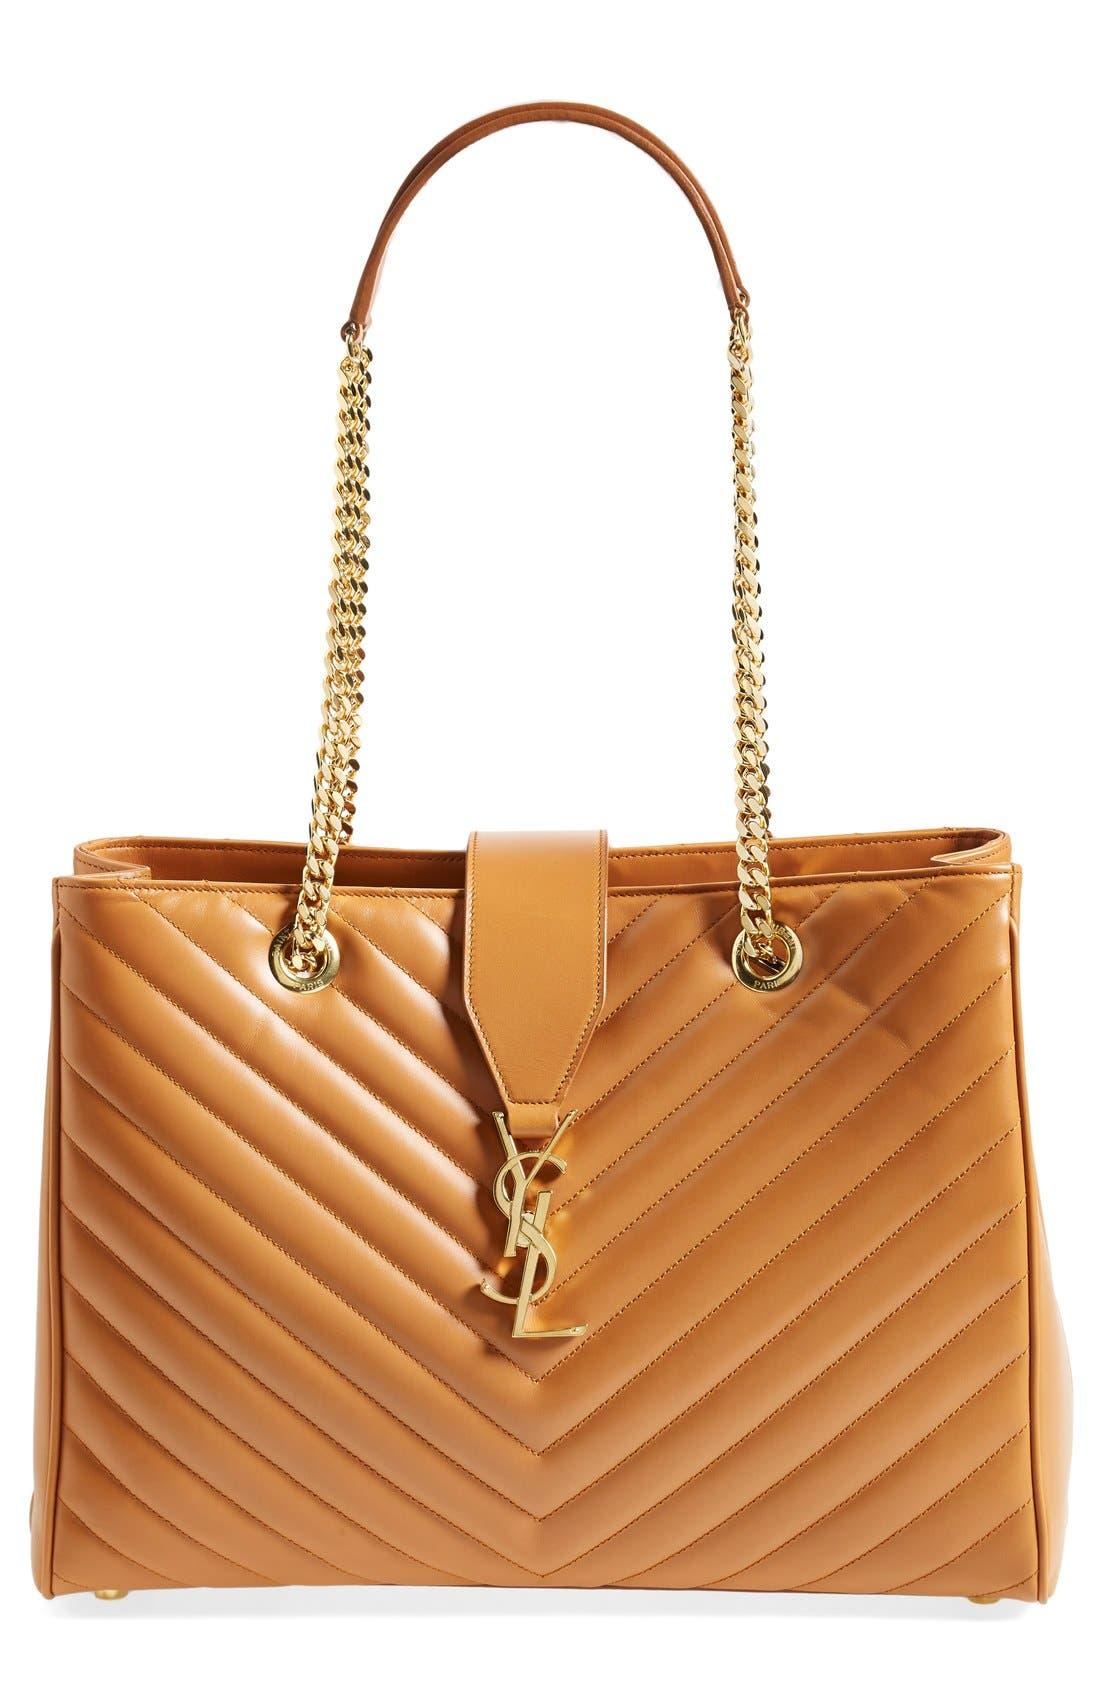 Alternate Image 1 Selected - Saint Laurent 'Cassandre' Leather Shopper